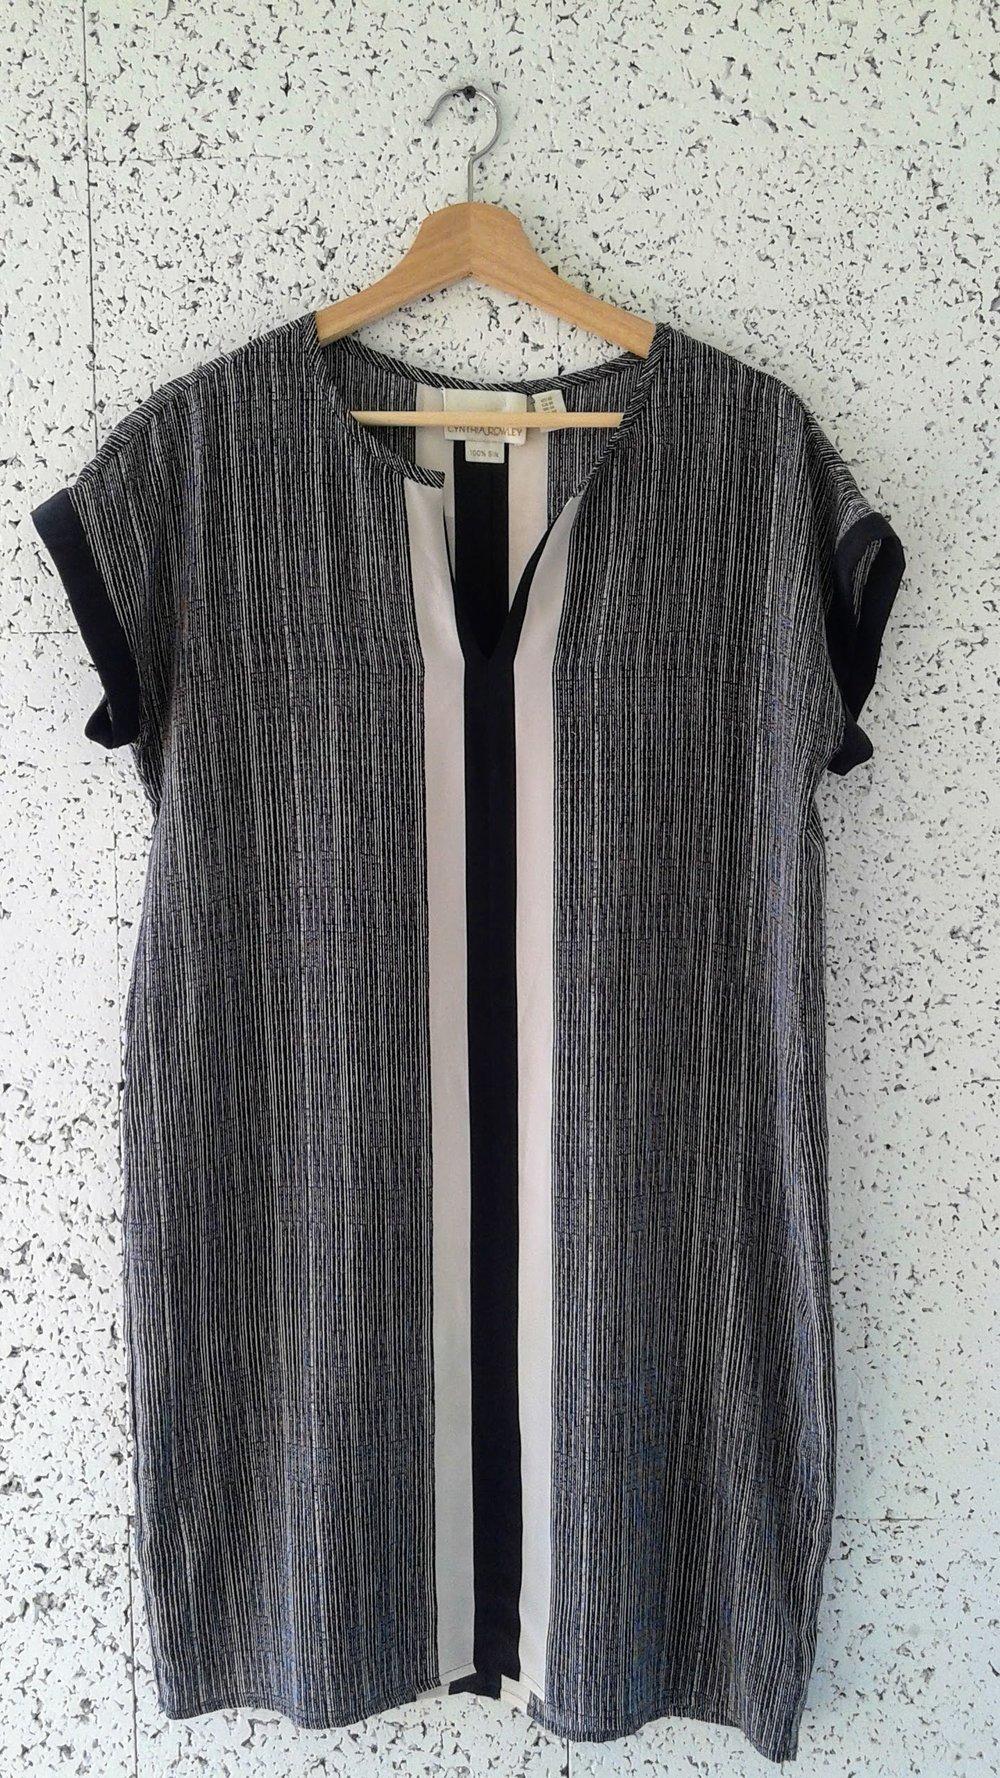 Cynthia Rowley tunic; Size 10, $28